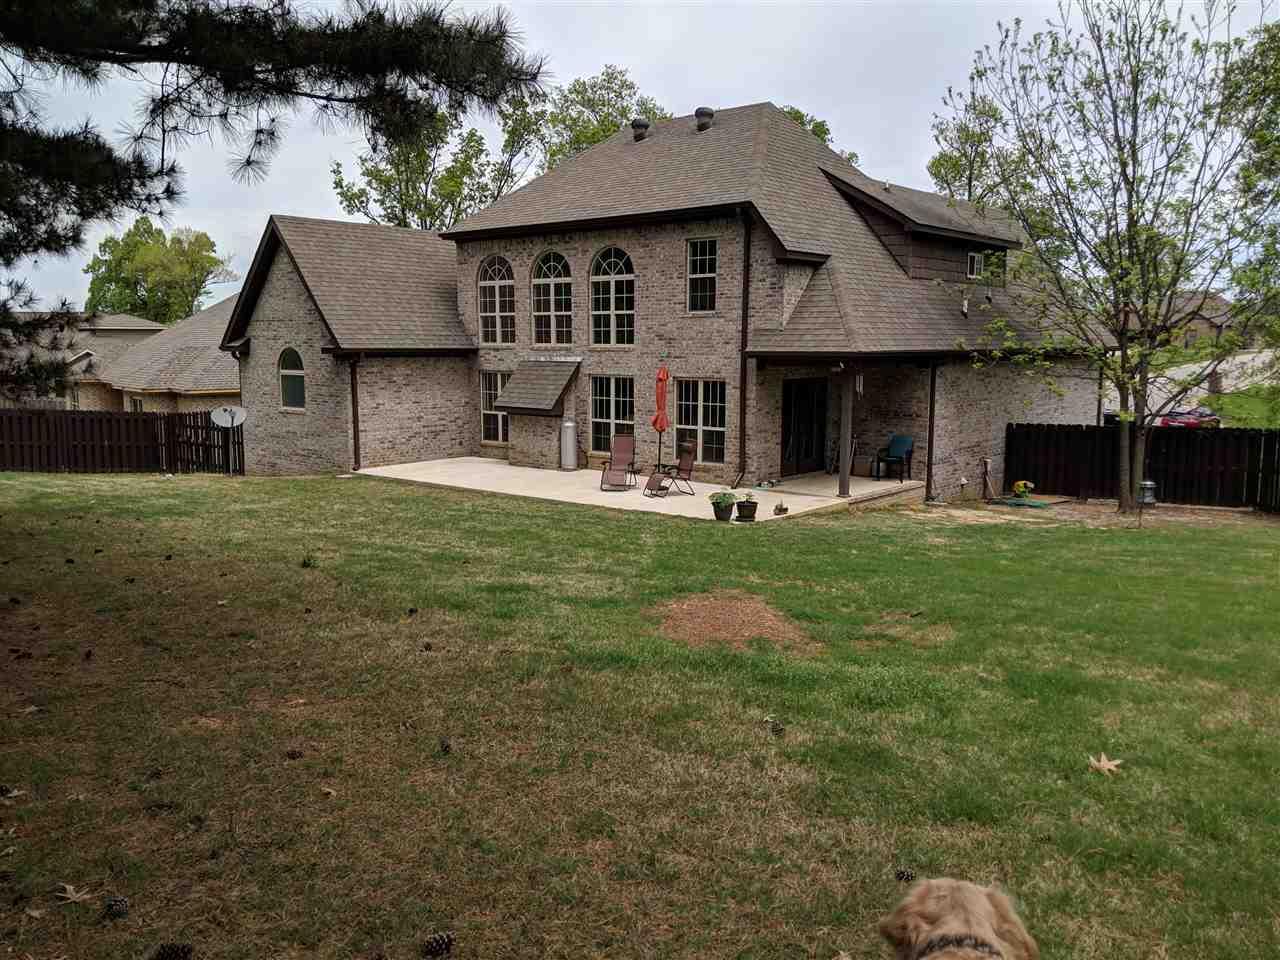 4101 Lone Cypress cove Jonesboro, AR 72401